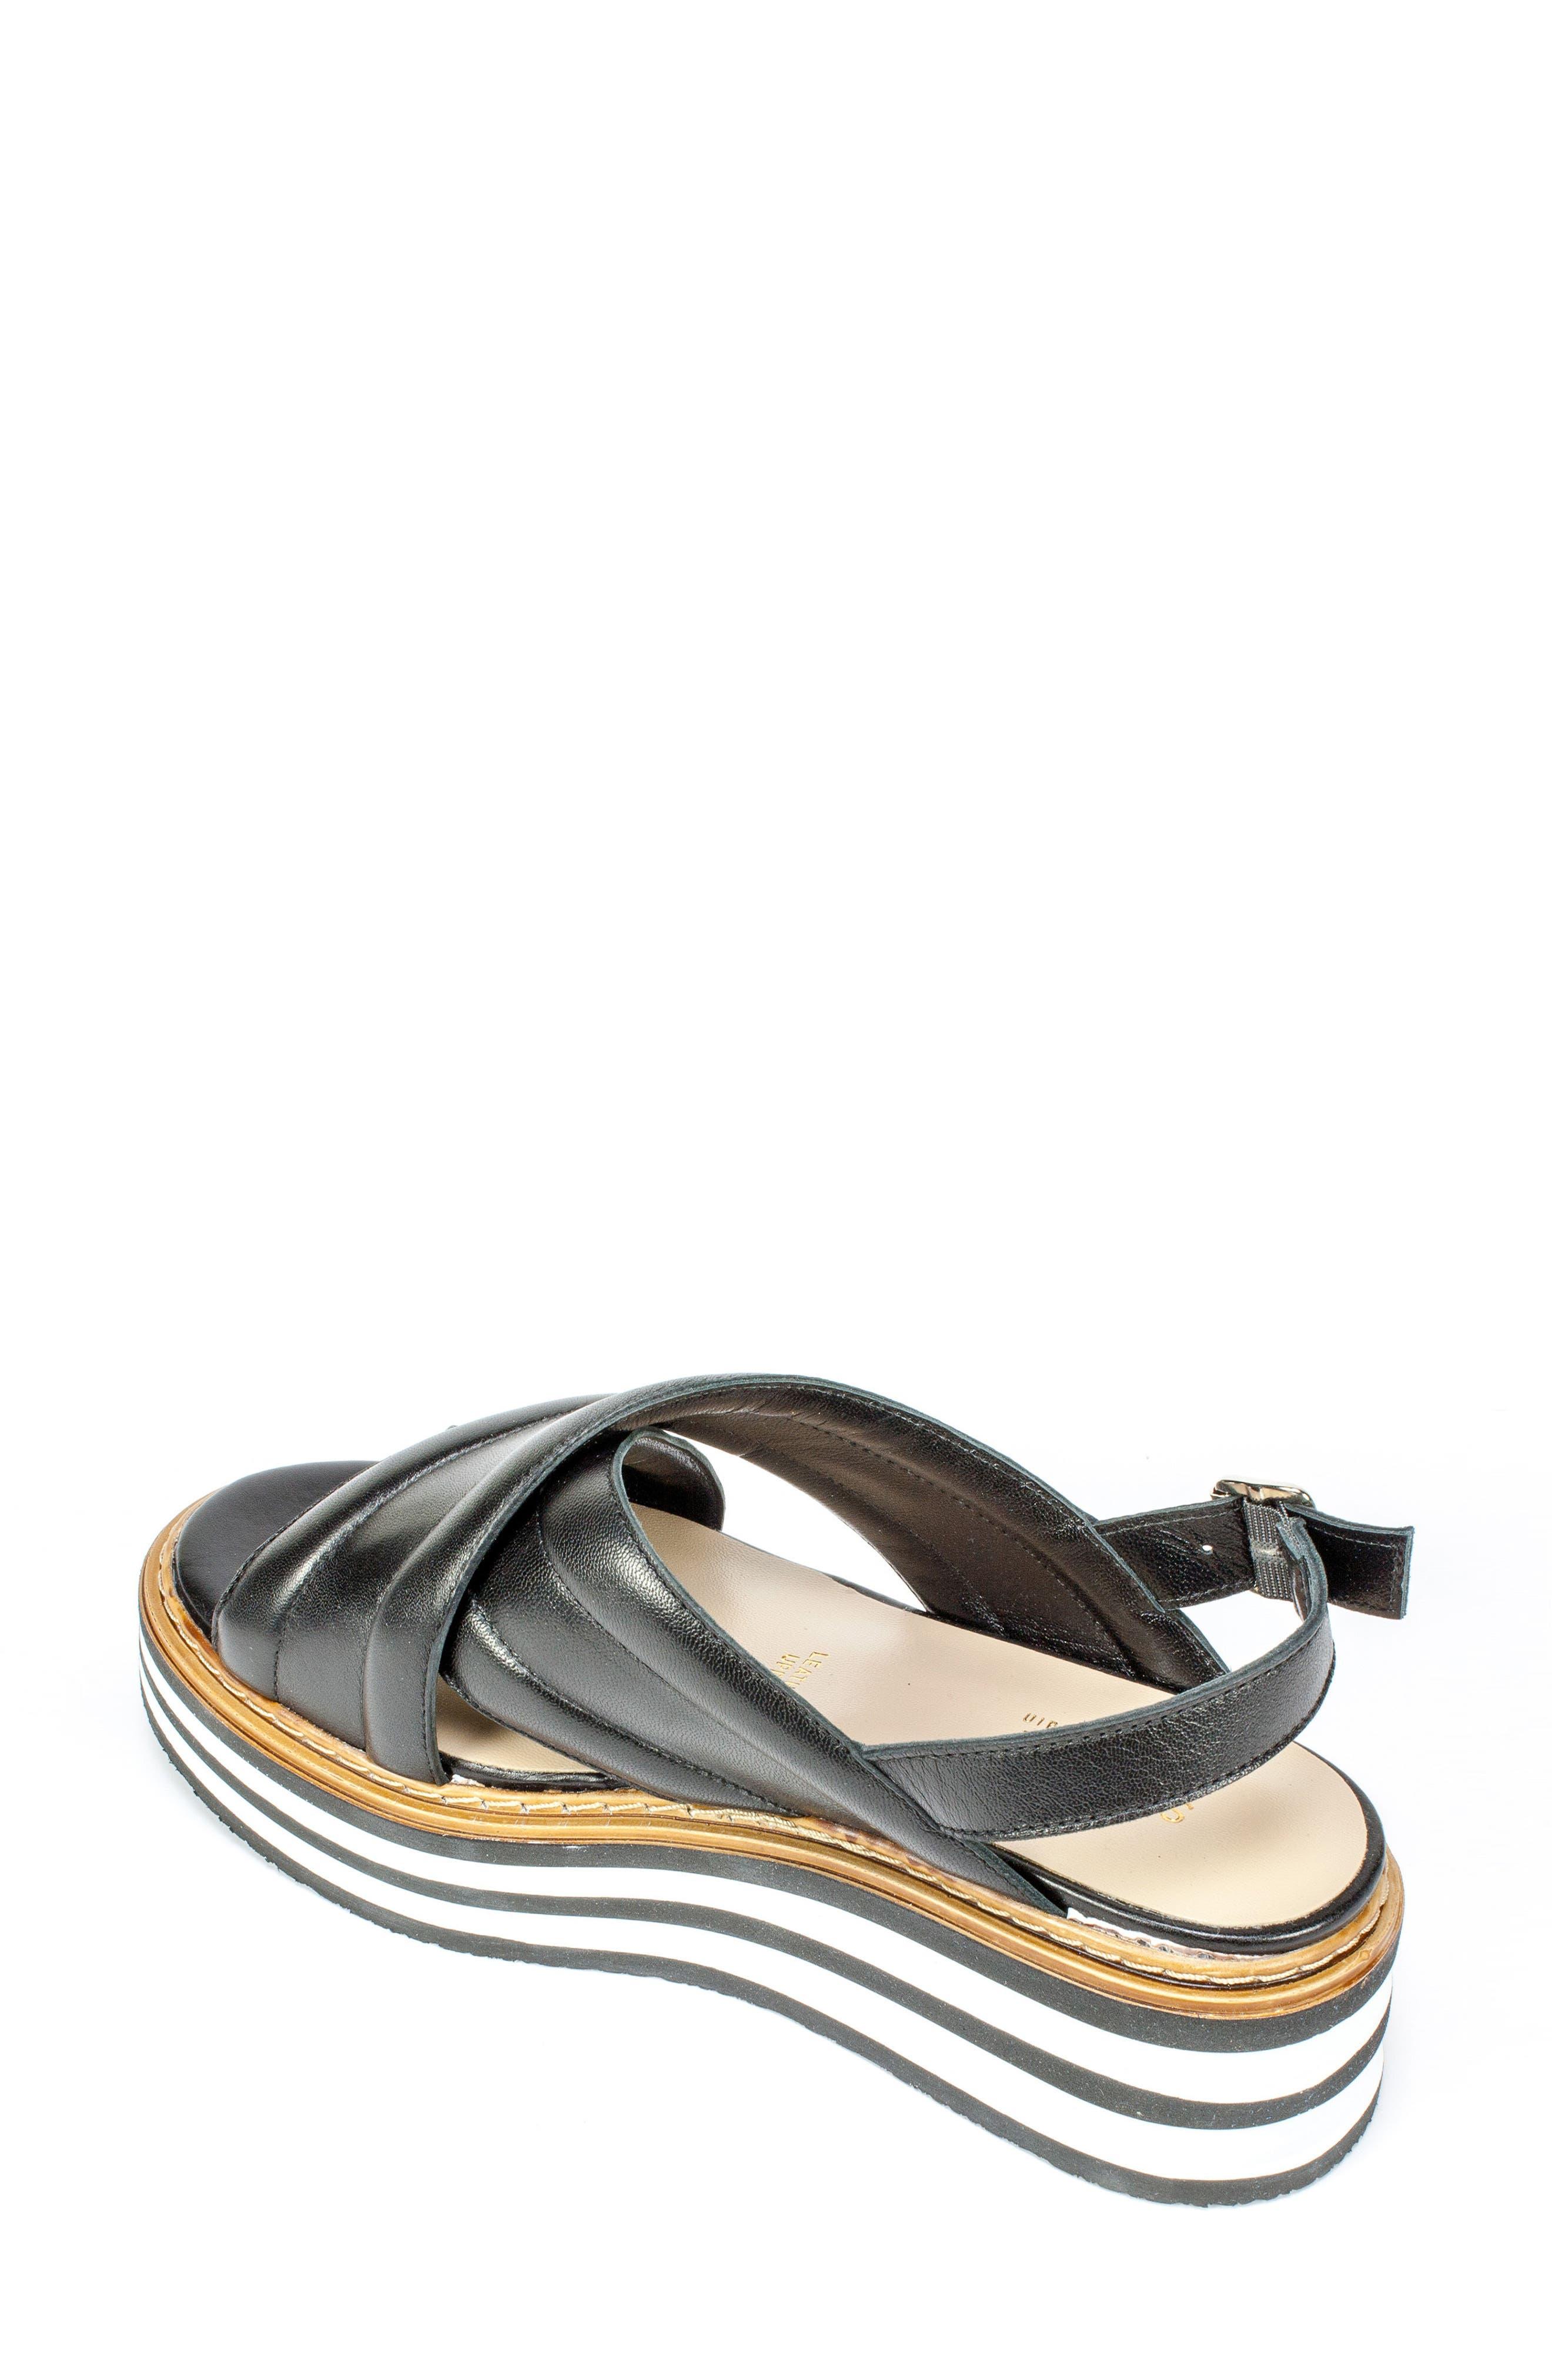 Leanna Platform Sandal,                             Alternate thumbnail 2, color,                             Black Leather